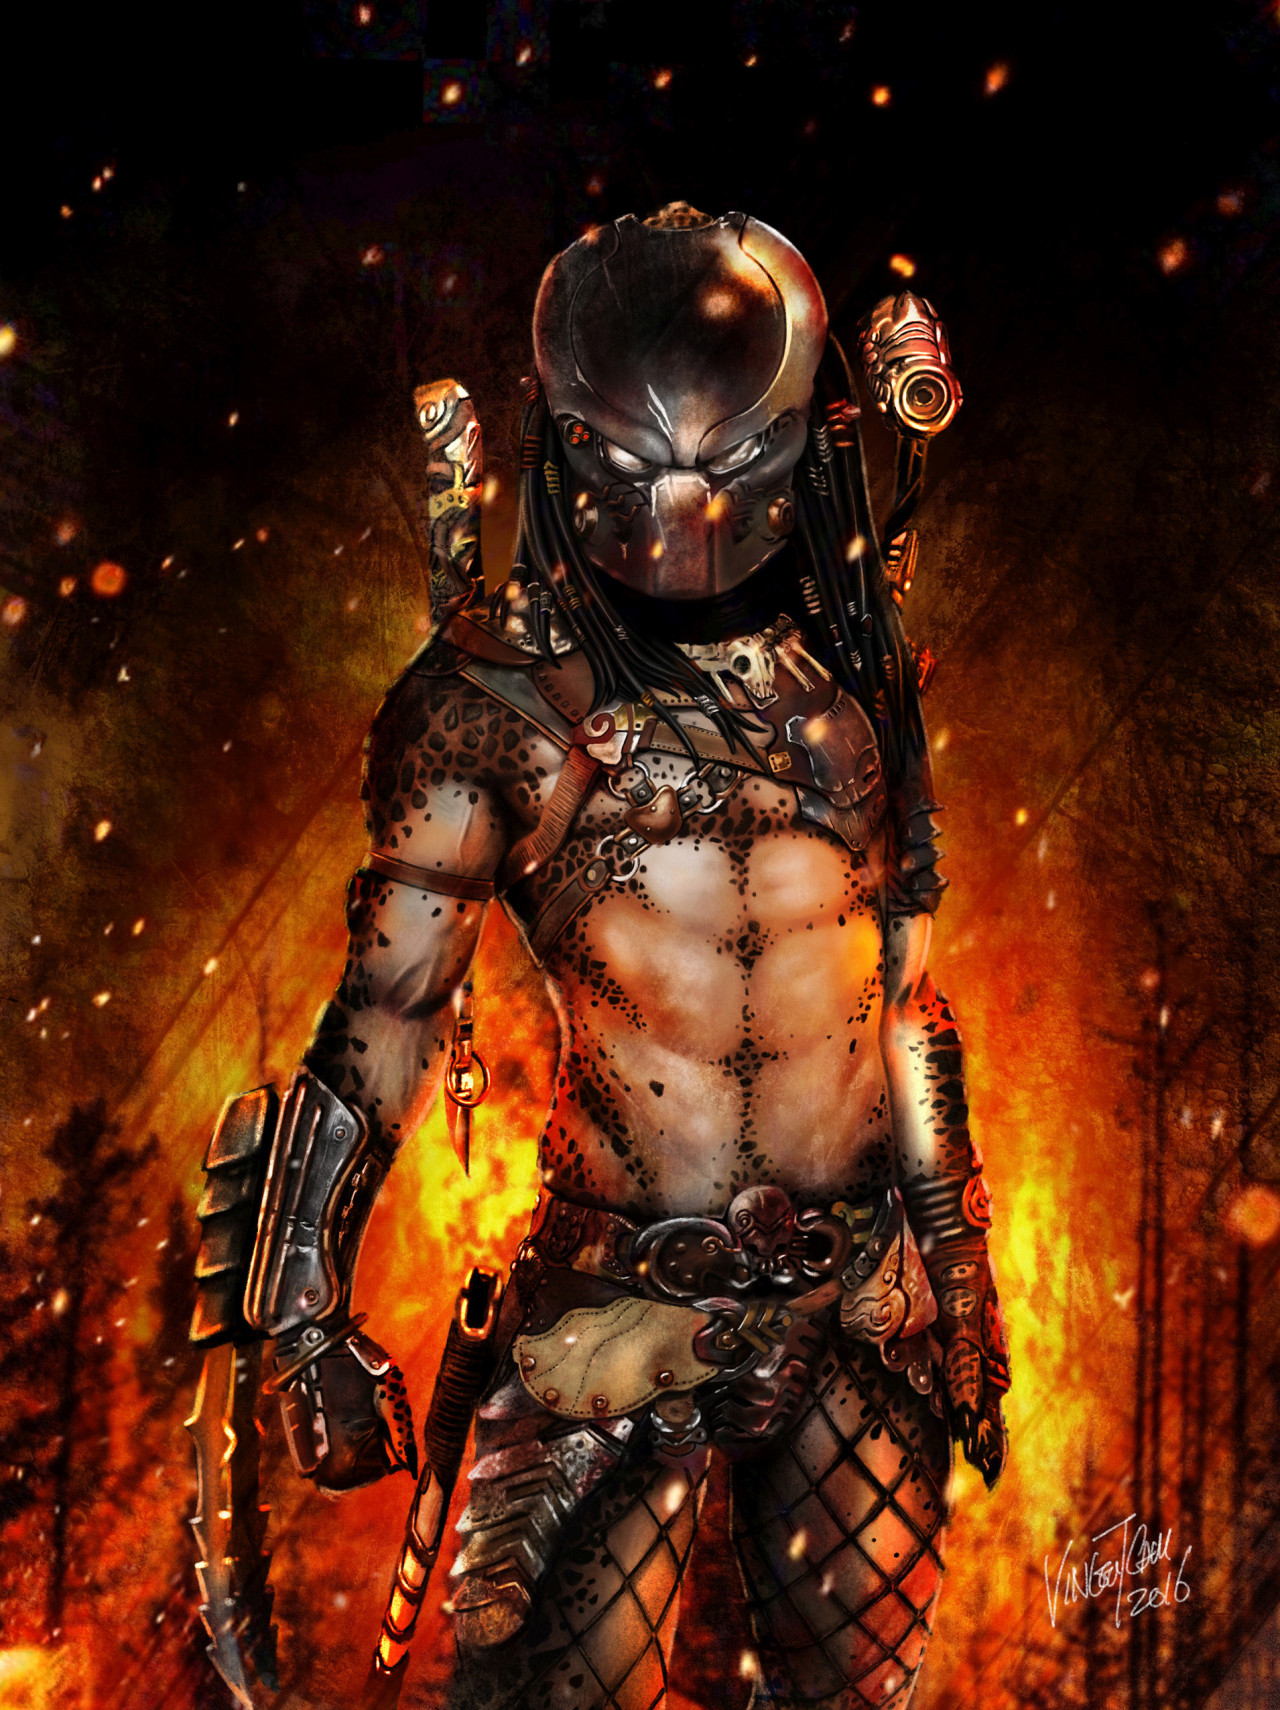 #fine art#male#warrior#swords#blades#armor#fire#flames#fantasy